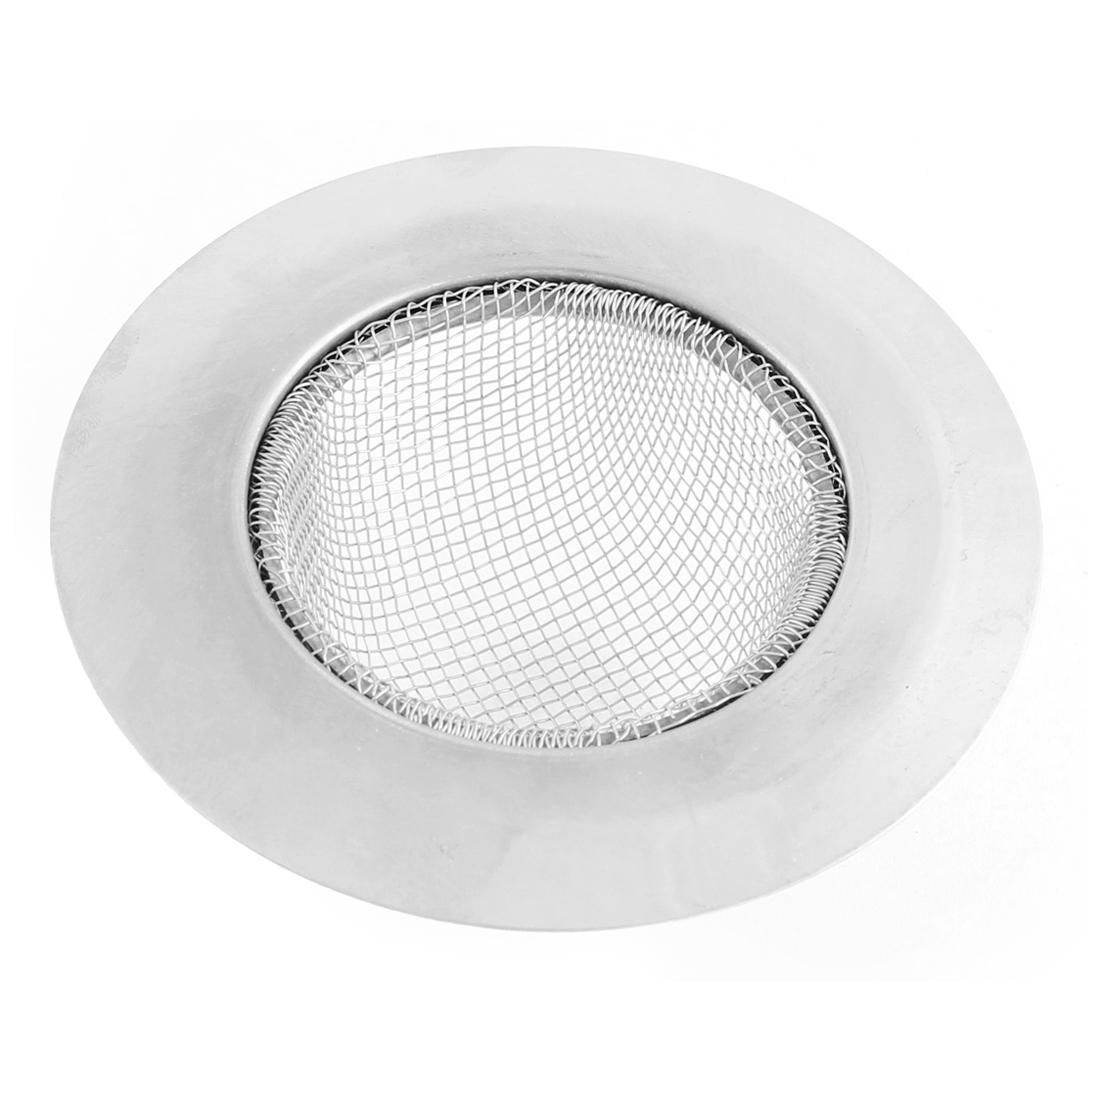 Kitchen Bathroom Metal Basin Sink Floor Mesh Drainer Strainer Filter Hair Stopper 90mm Dia